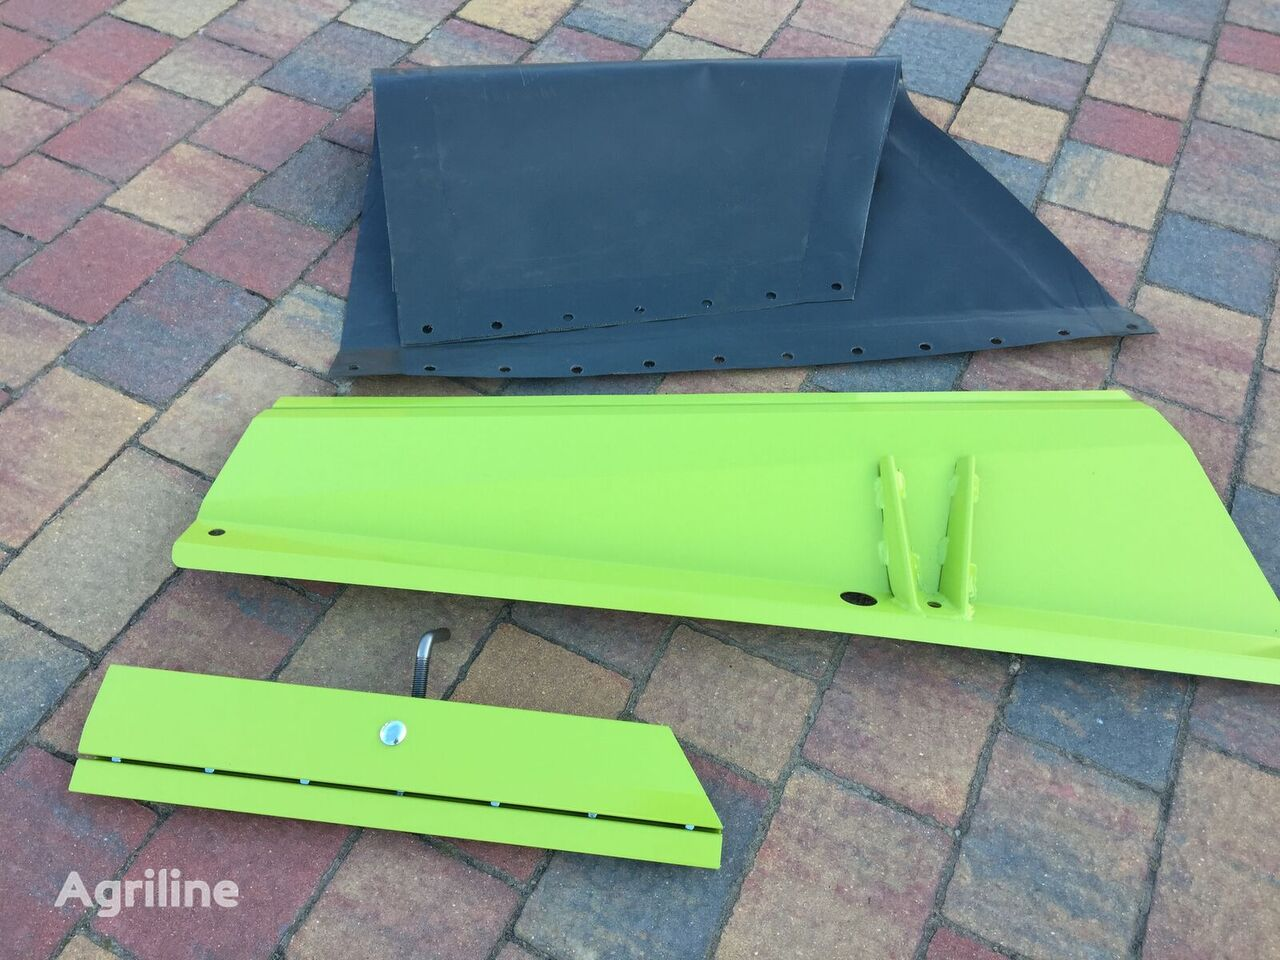 new front fascia for CLAAS LEXION, TUCANO grain header